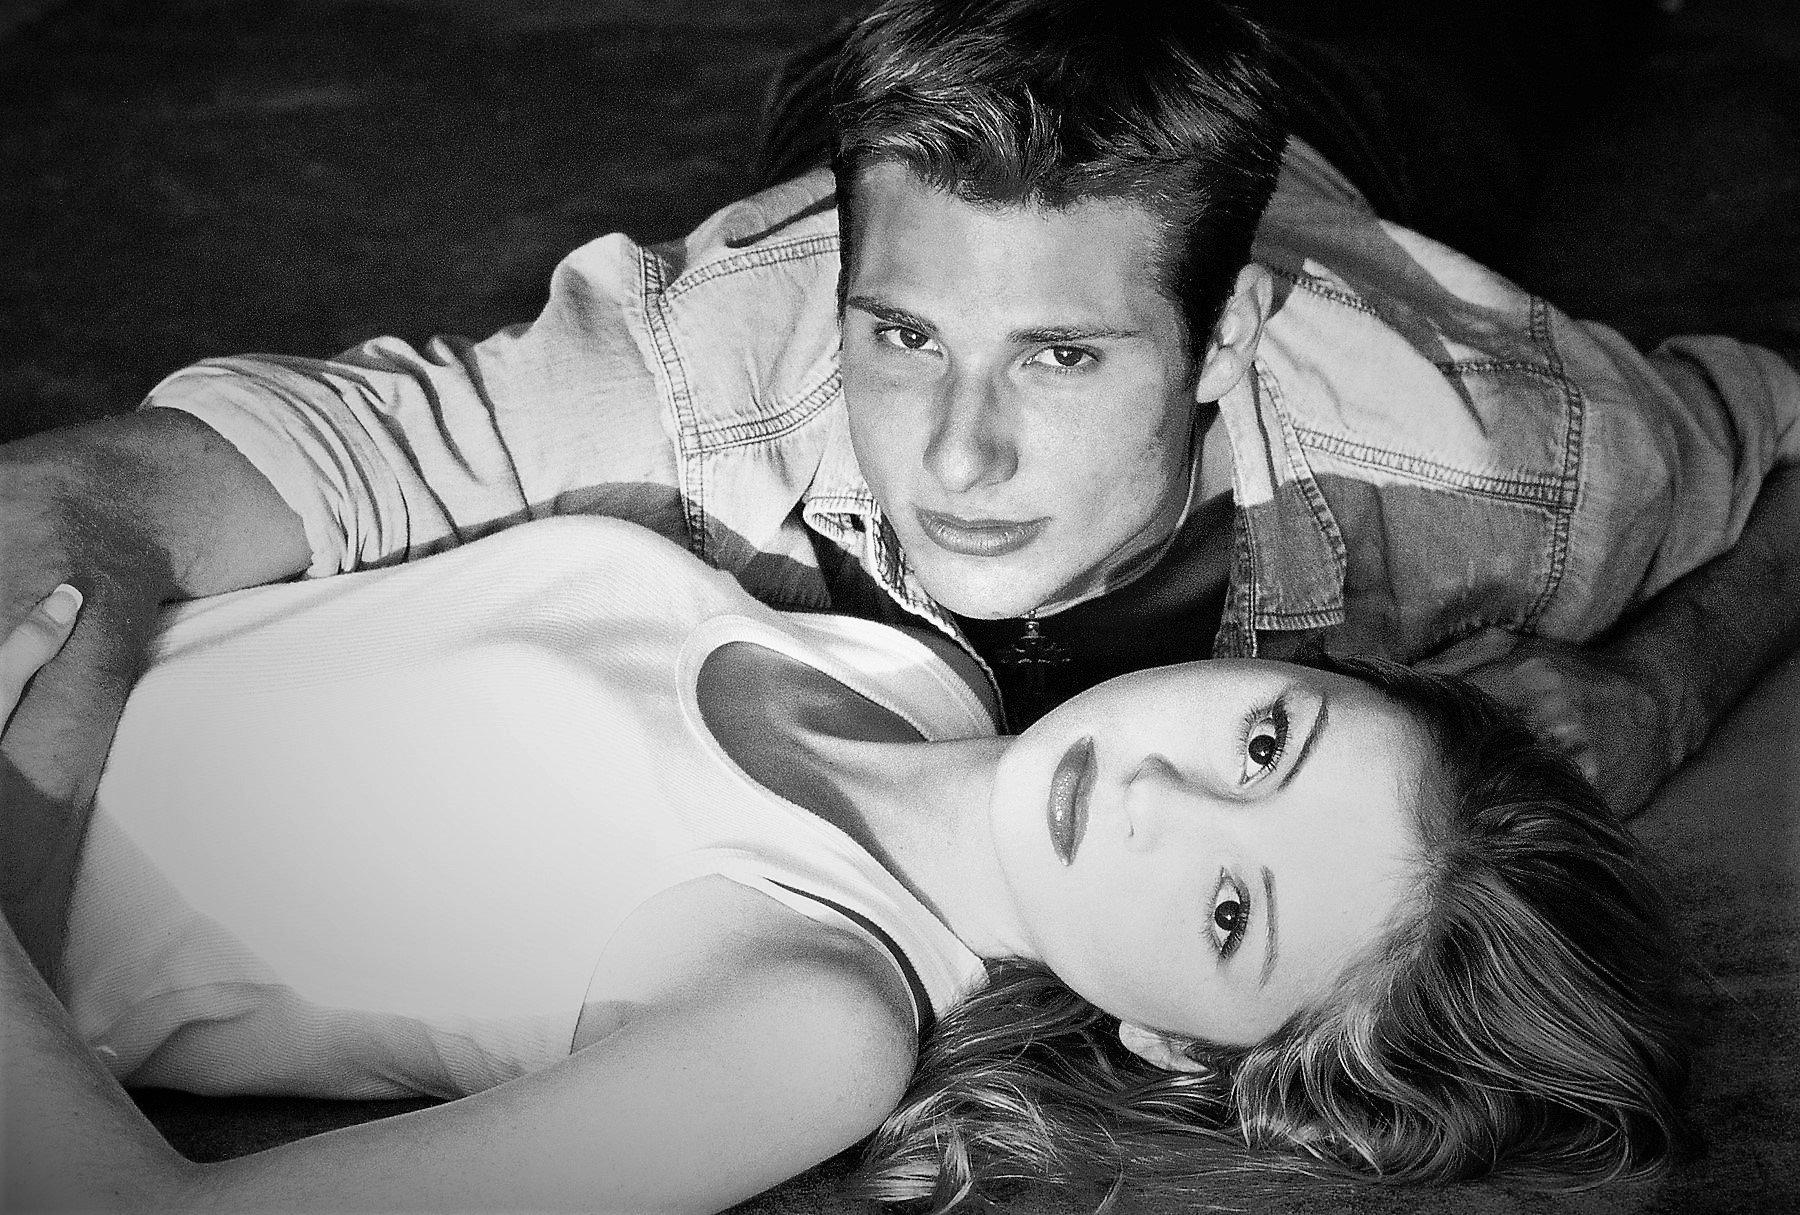 MODEL COUPLE LUKE AND MARISSA